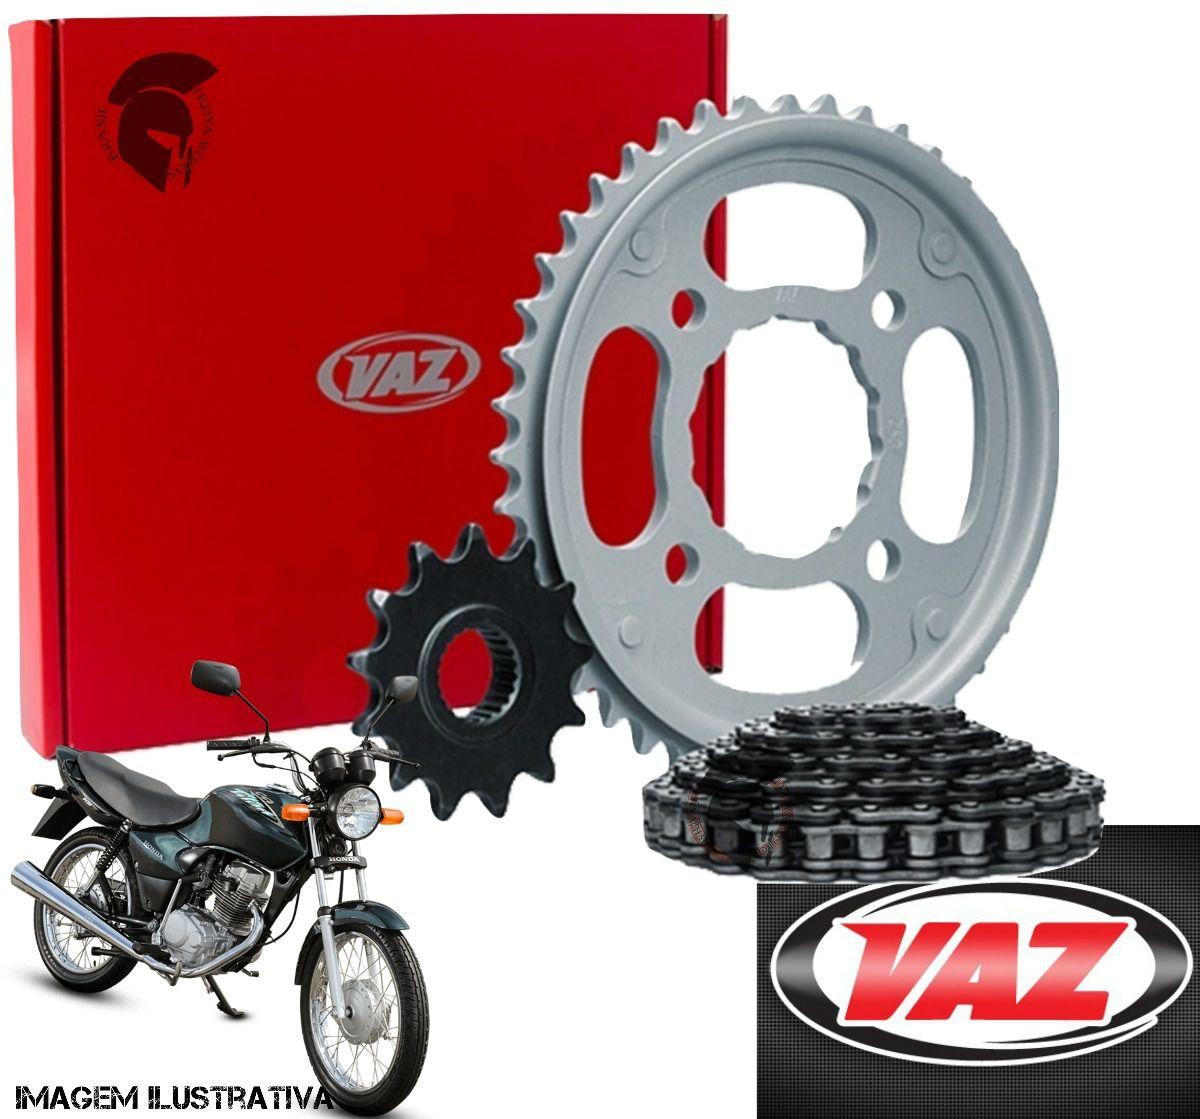 Kit Relação Transmissao Vaz Xtreme Honda  Cg 125 Fan 09 até 13